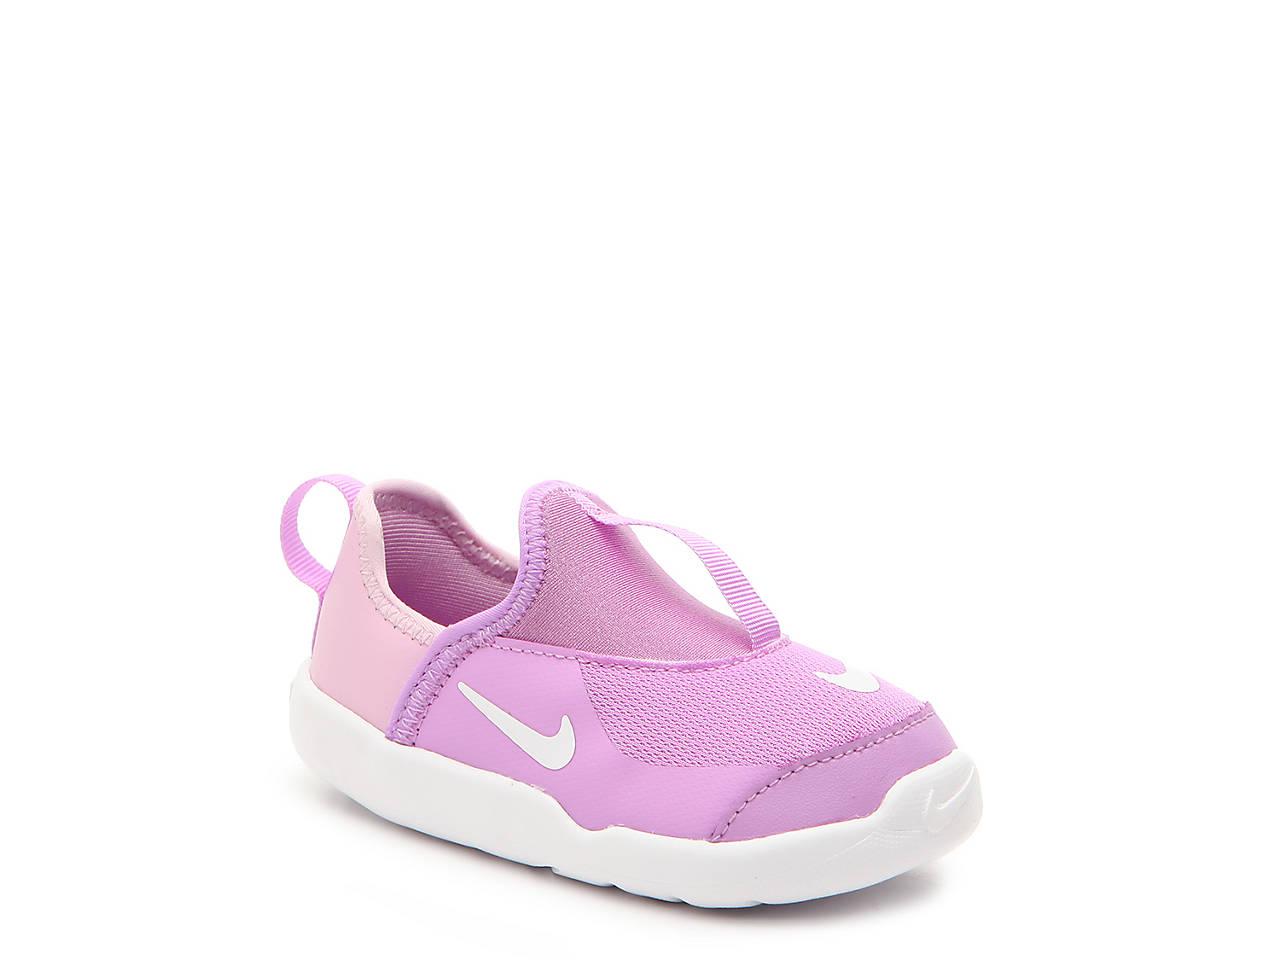 6c91479f07 Nike Lil Swoosh Infant   Toddler Slip-On Sneaker Kids Shoes